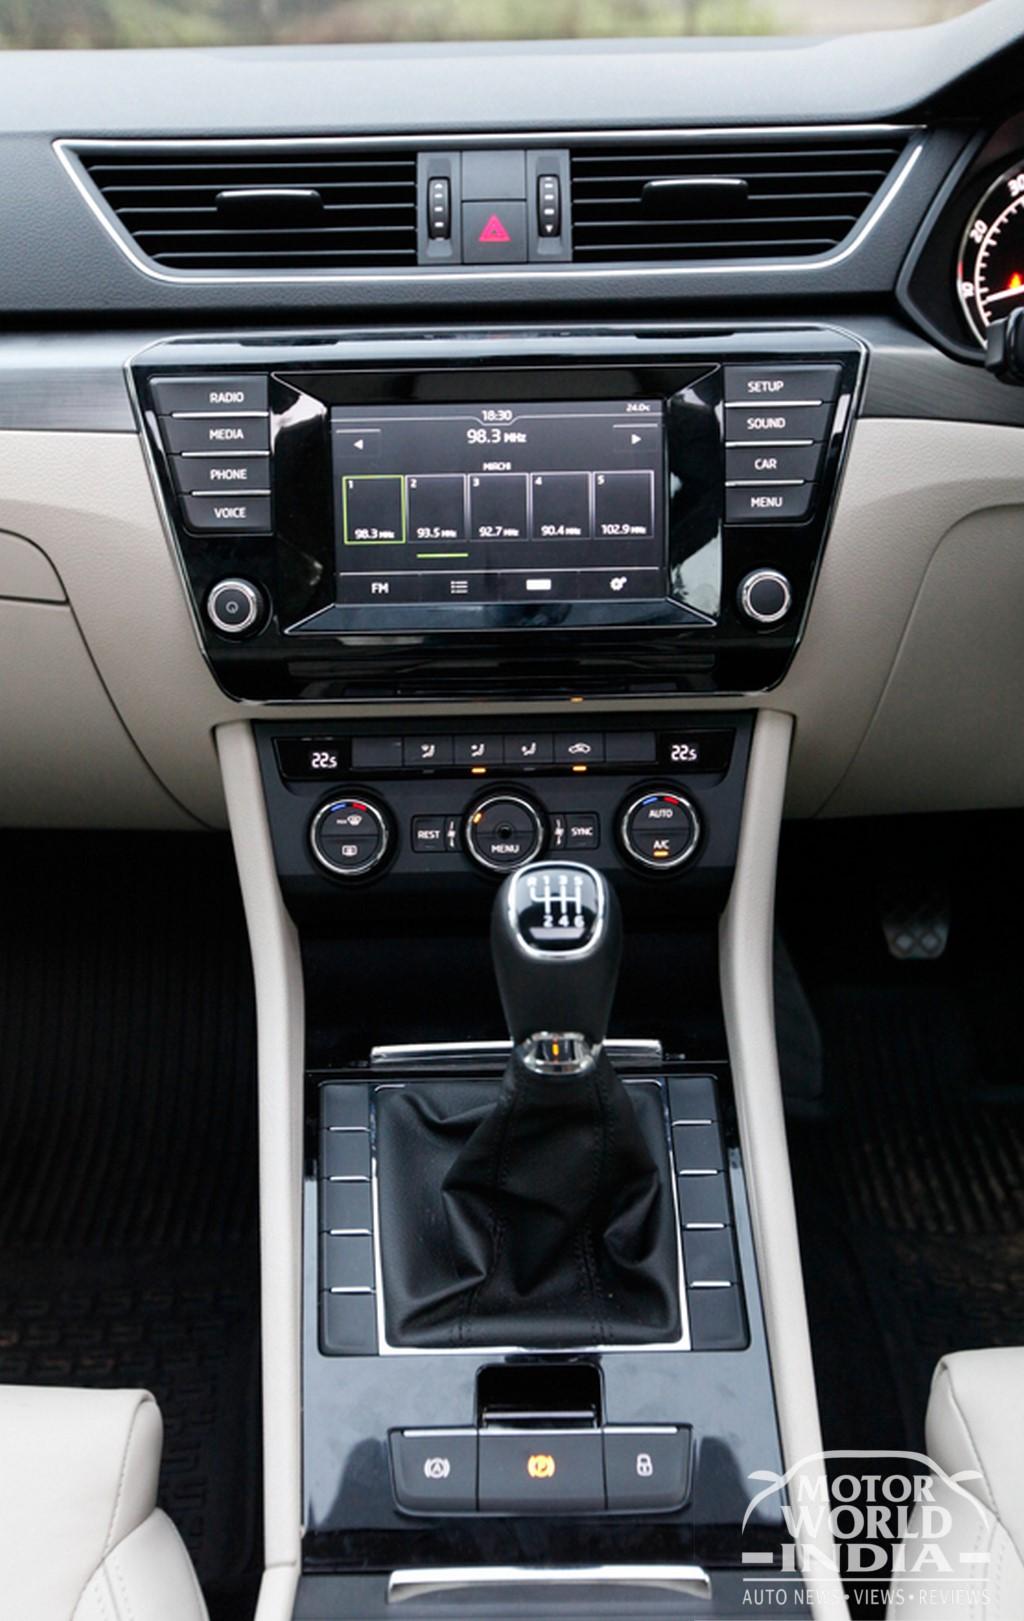 2016-Skoda-Superb-Interior-Dashboard (3)